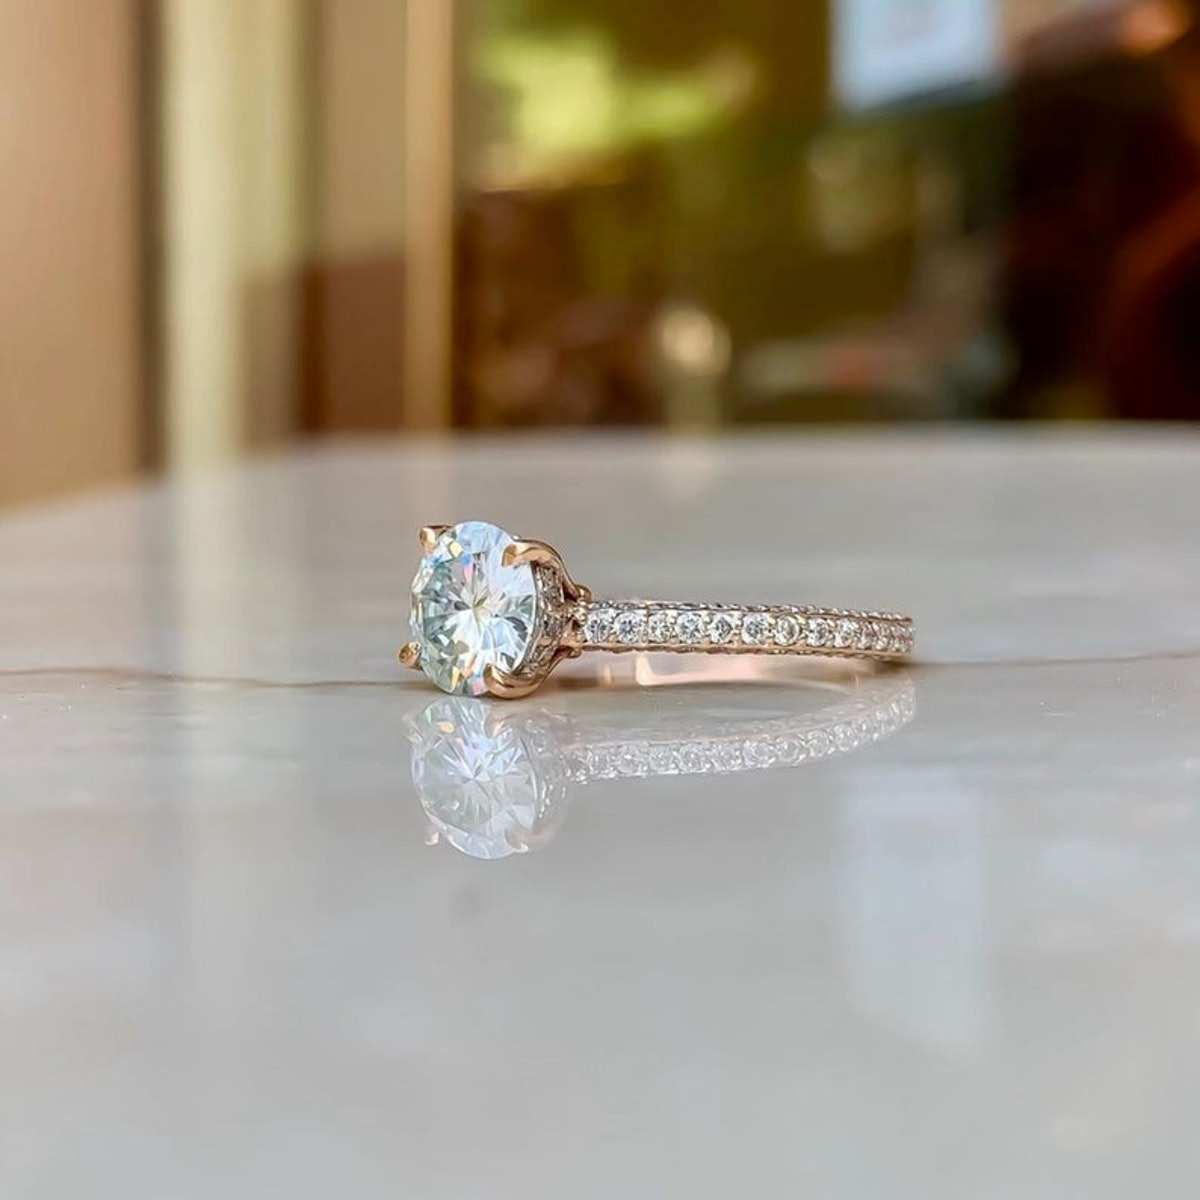 2.50 Ct White Round Moissanite Hidden Halo Engagement Ring, Wedding Ring in 14KT Rose Gold, Moissani...